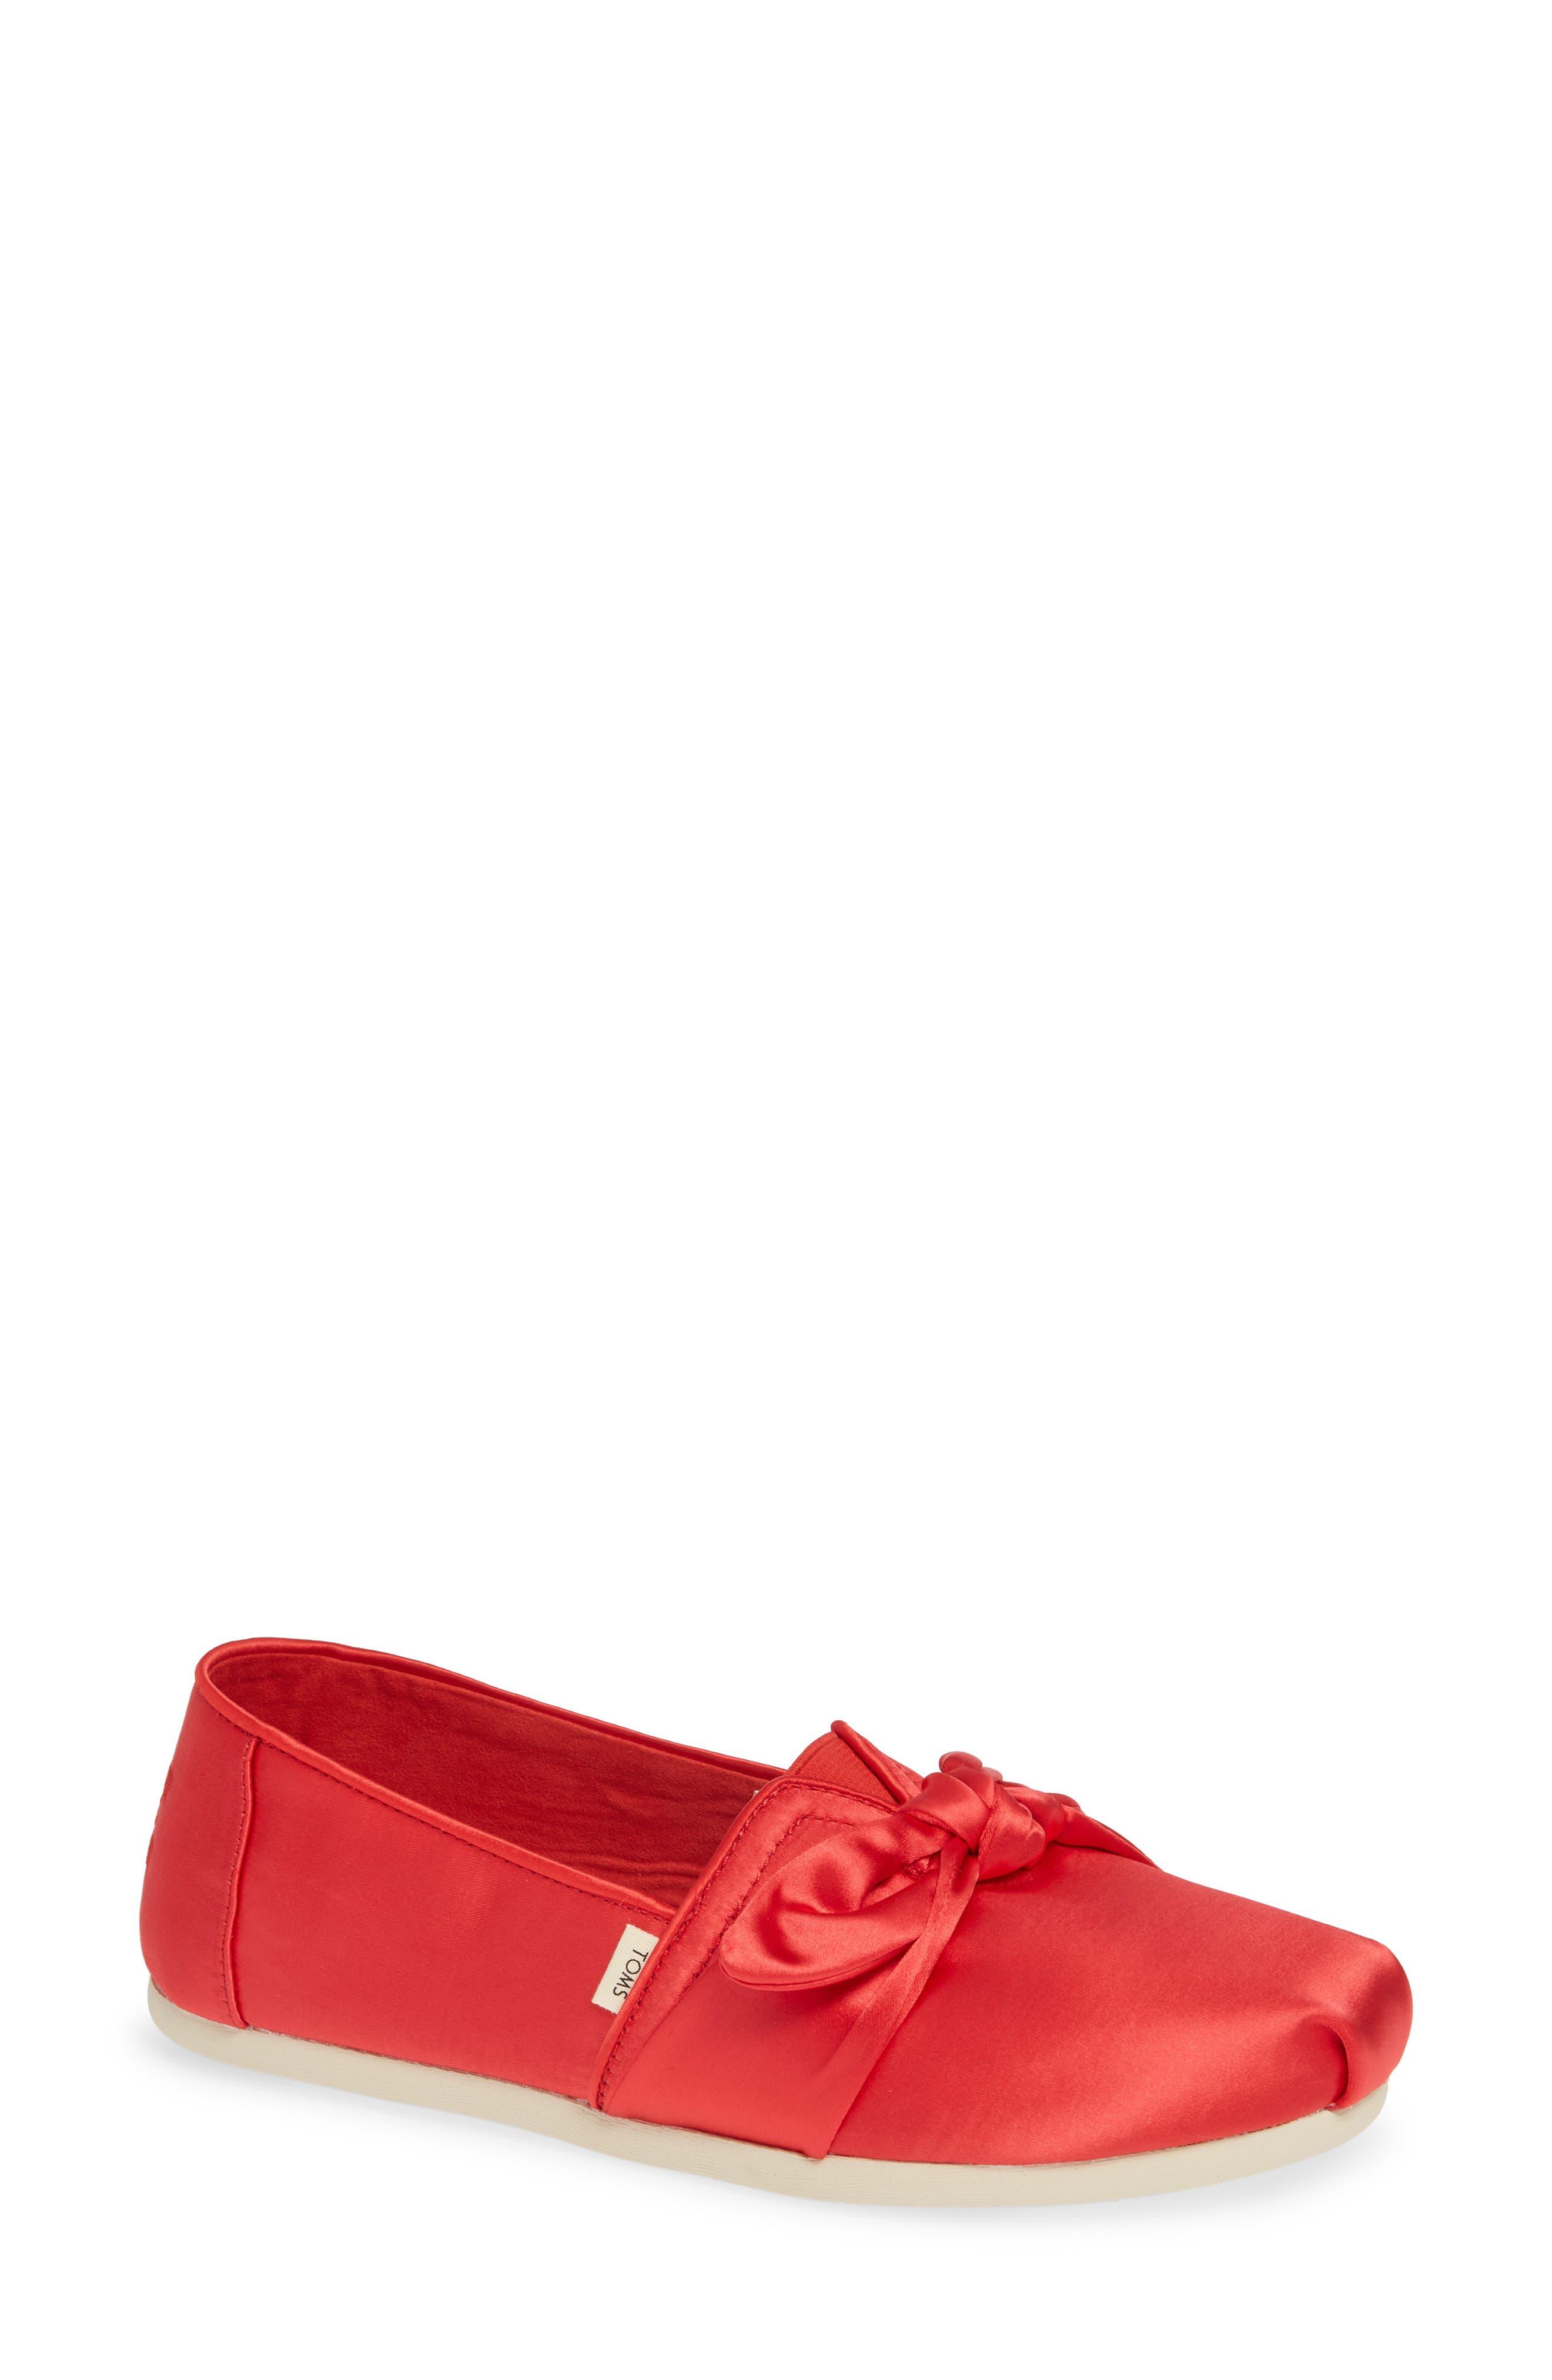 TOMS, Alpargata Bow Slip-On, Main thumbnail 1, color, RED LAVA FABRIC